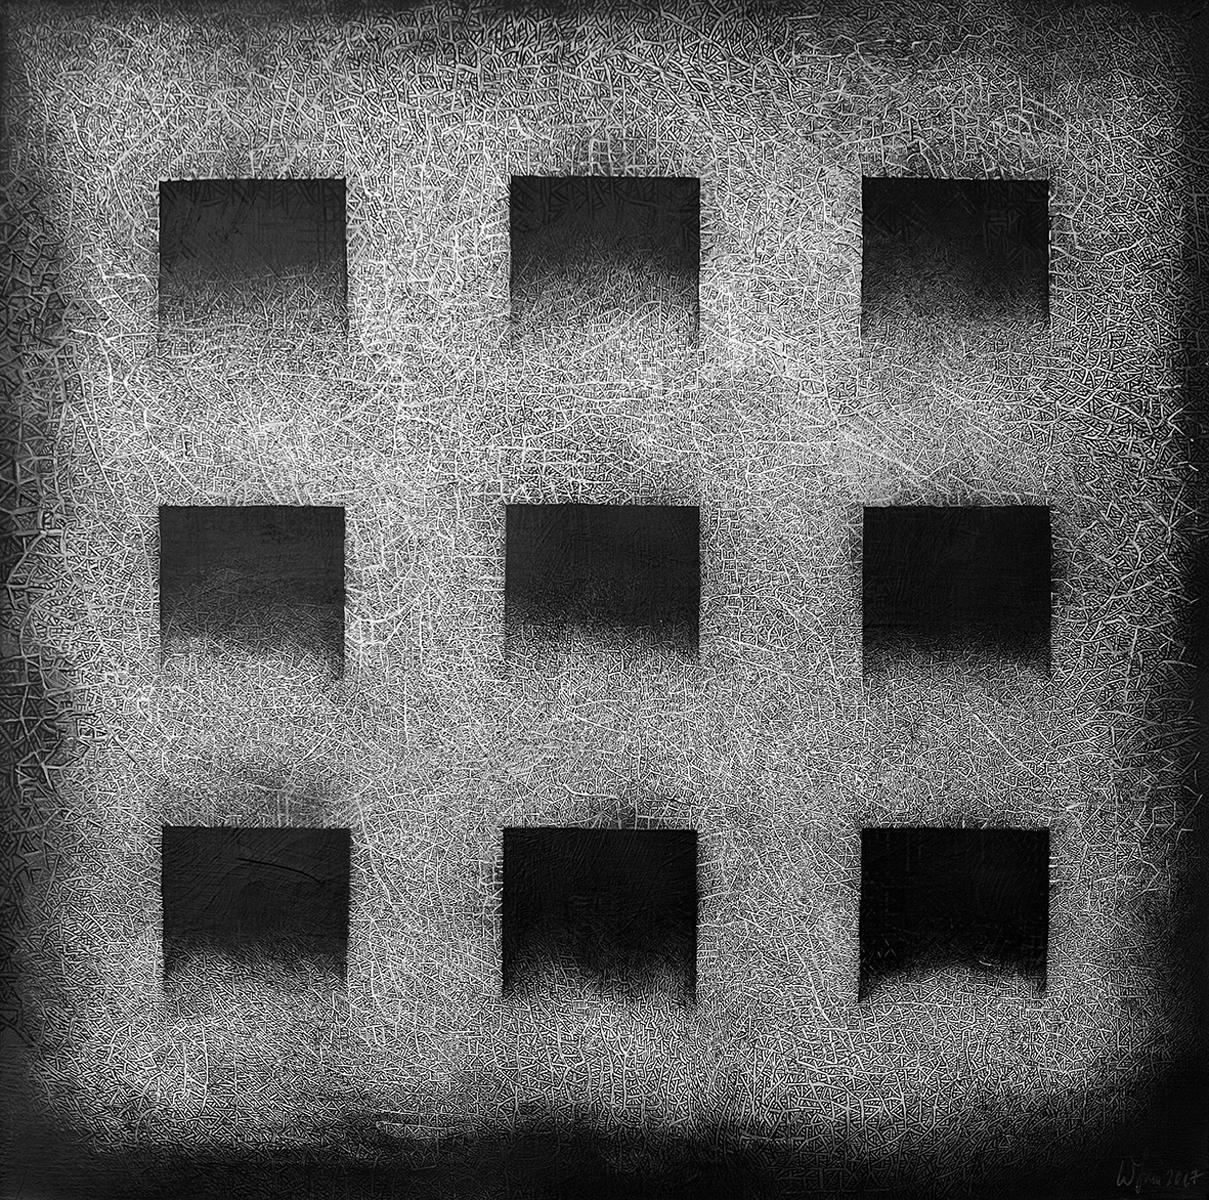 Struktury osobiste, 2017